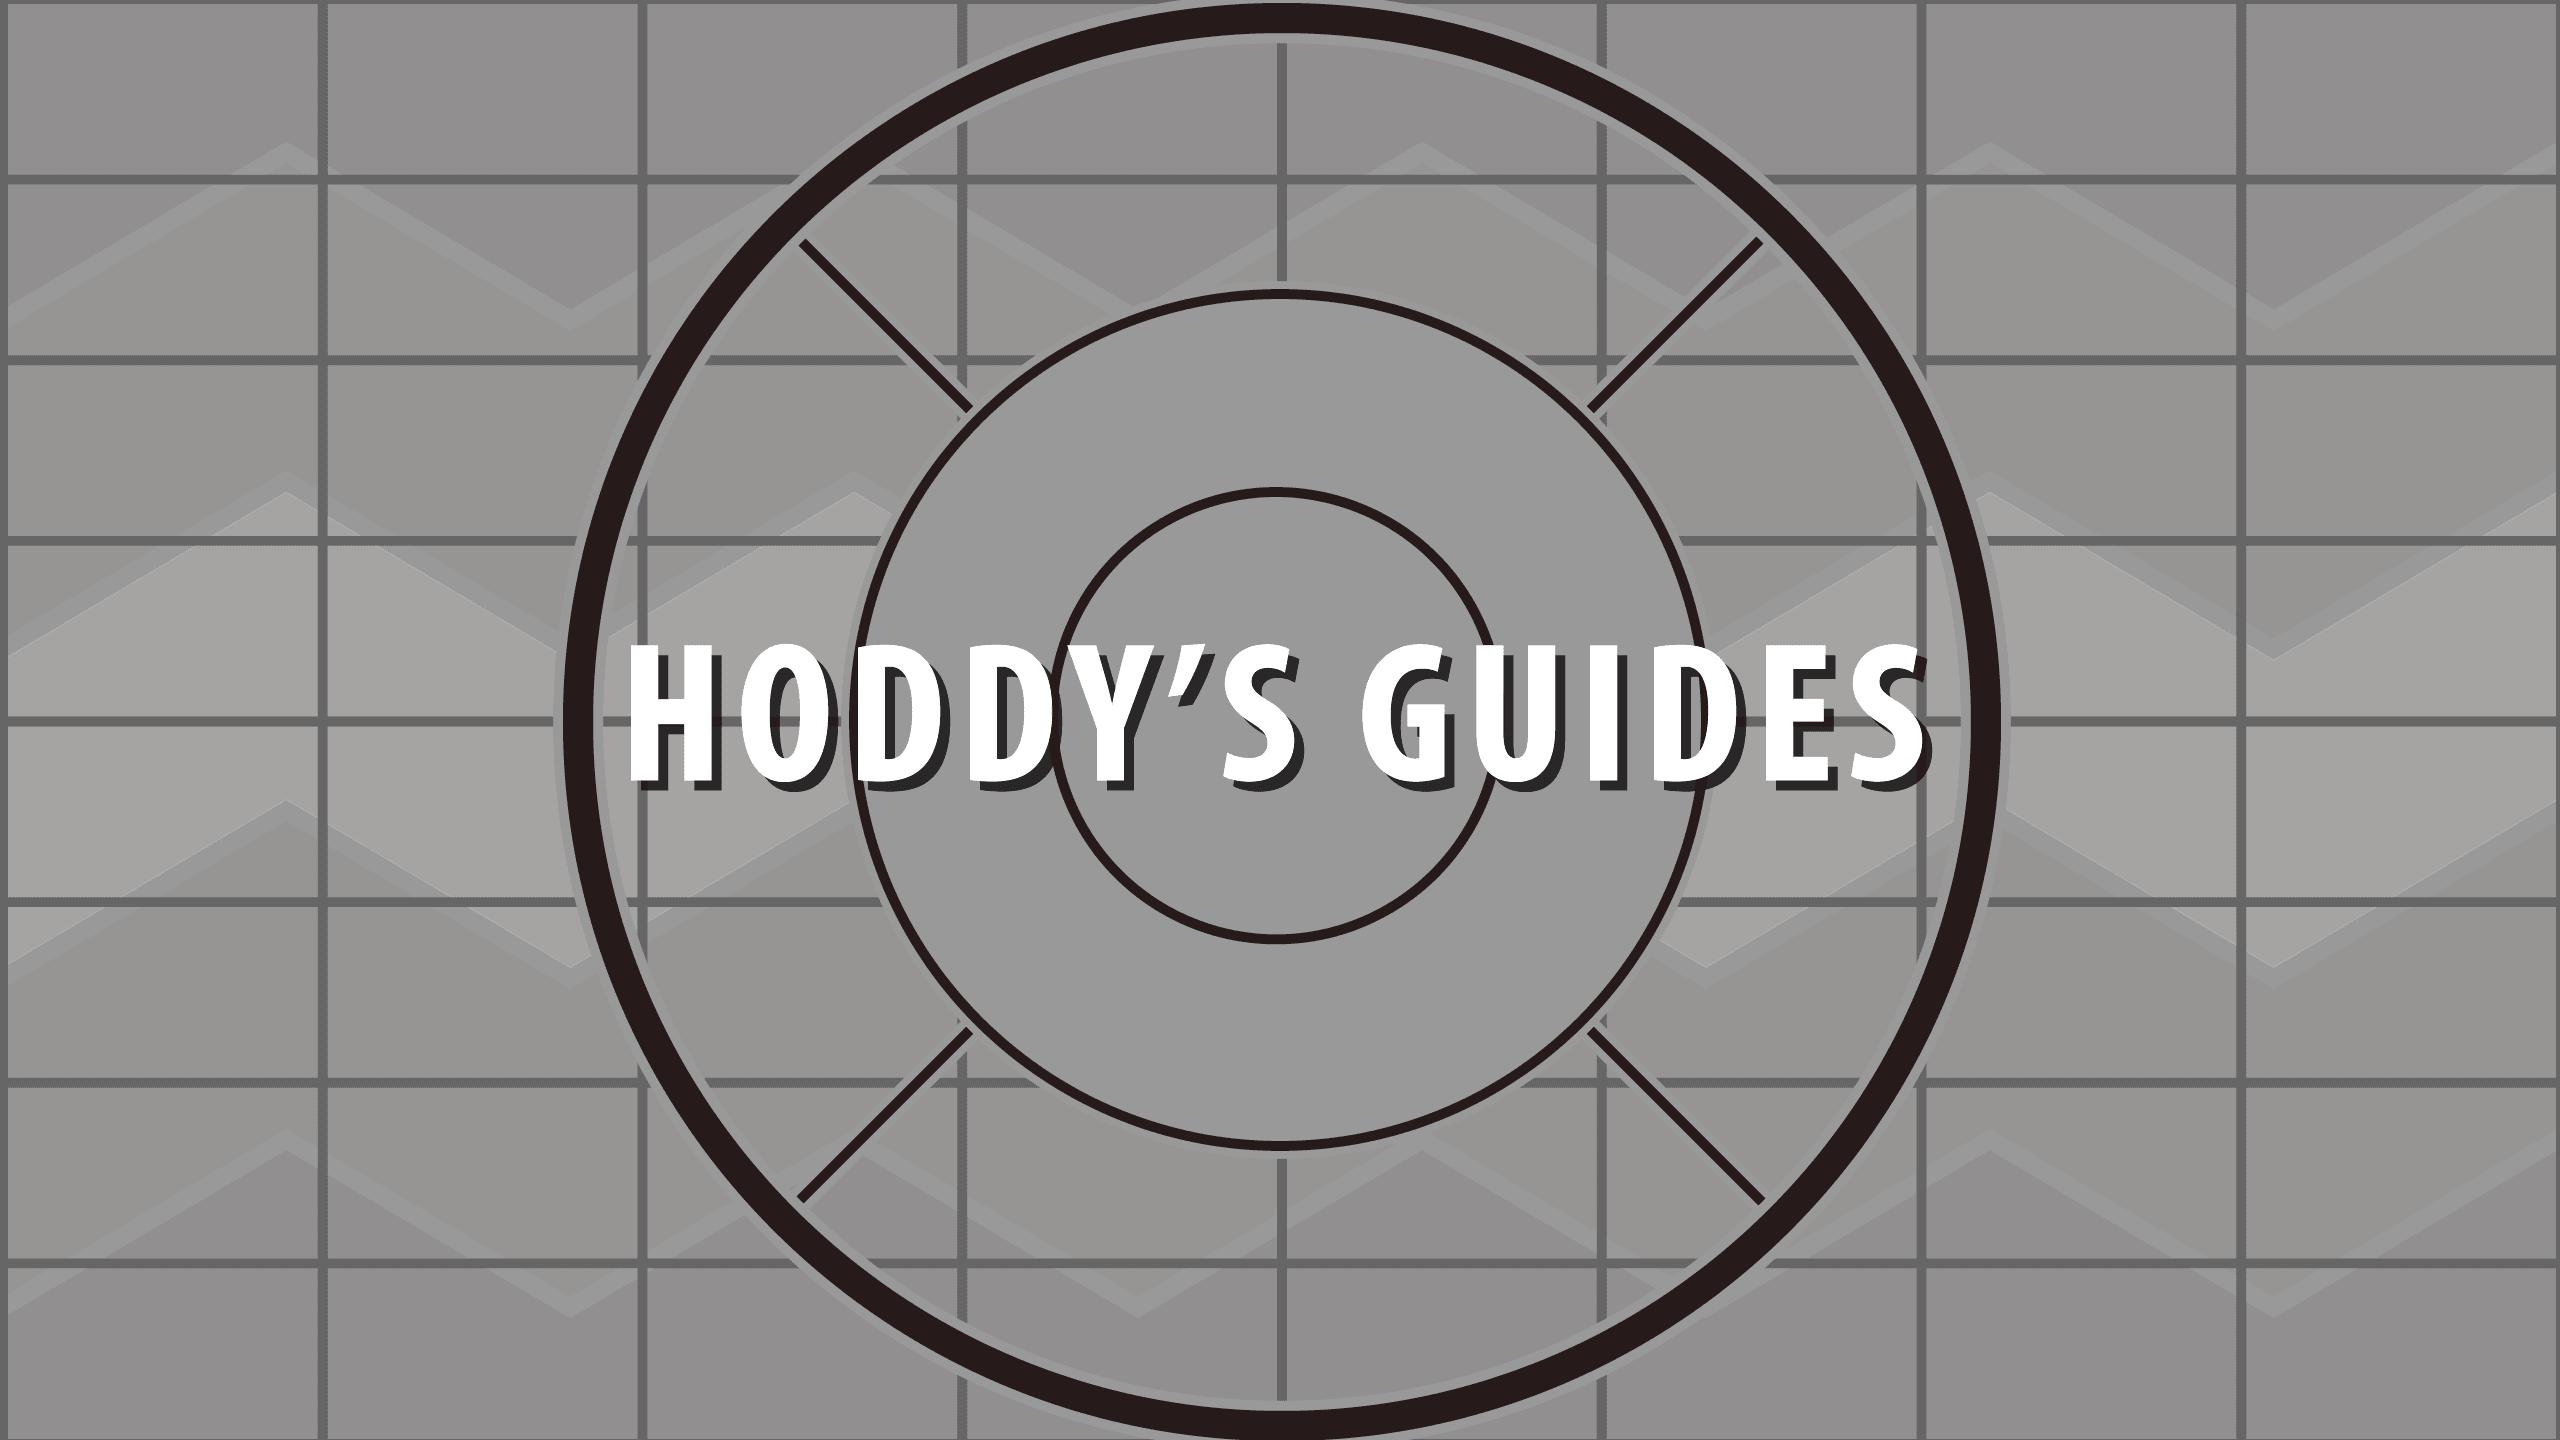 Hoddys Guides